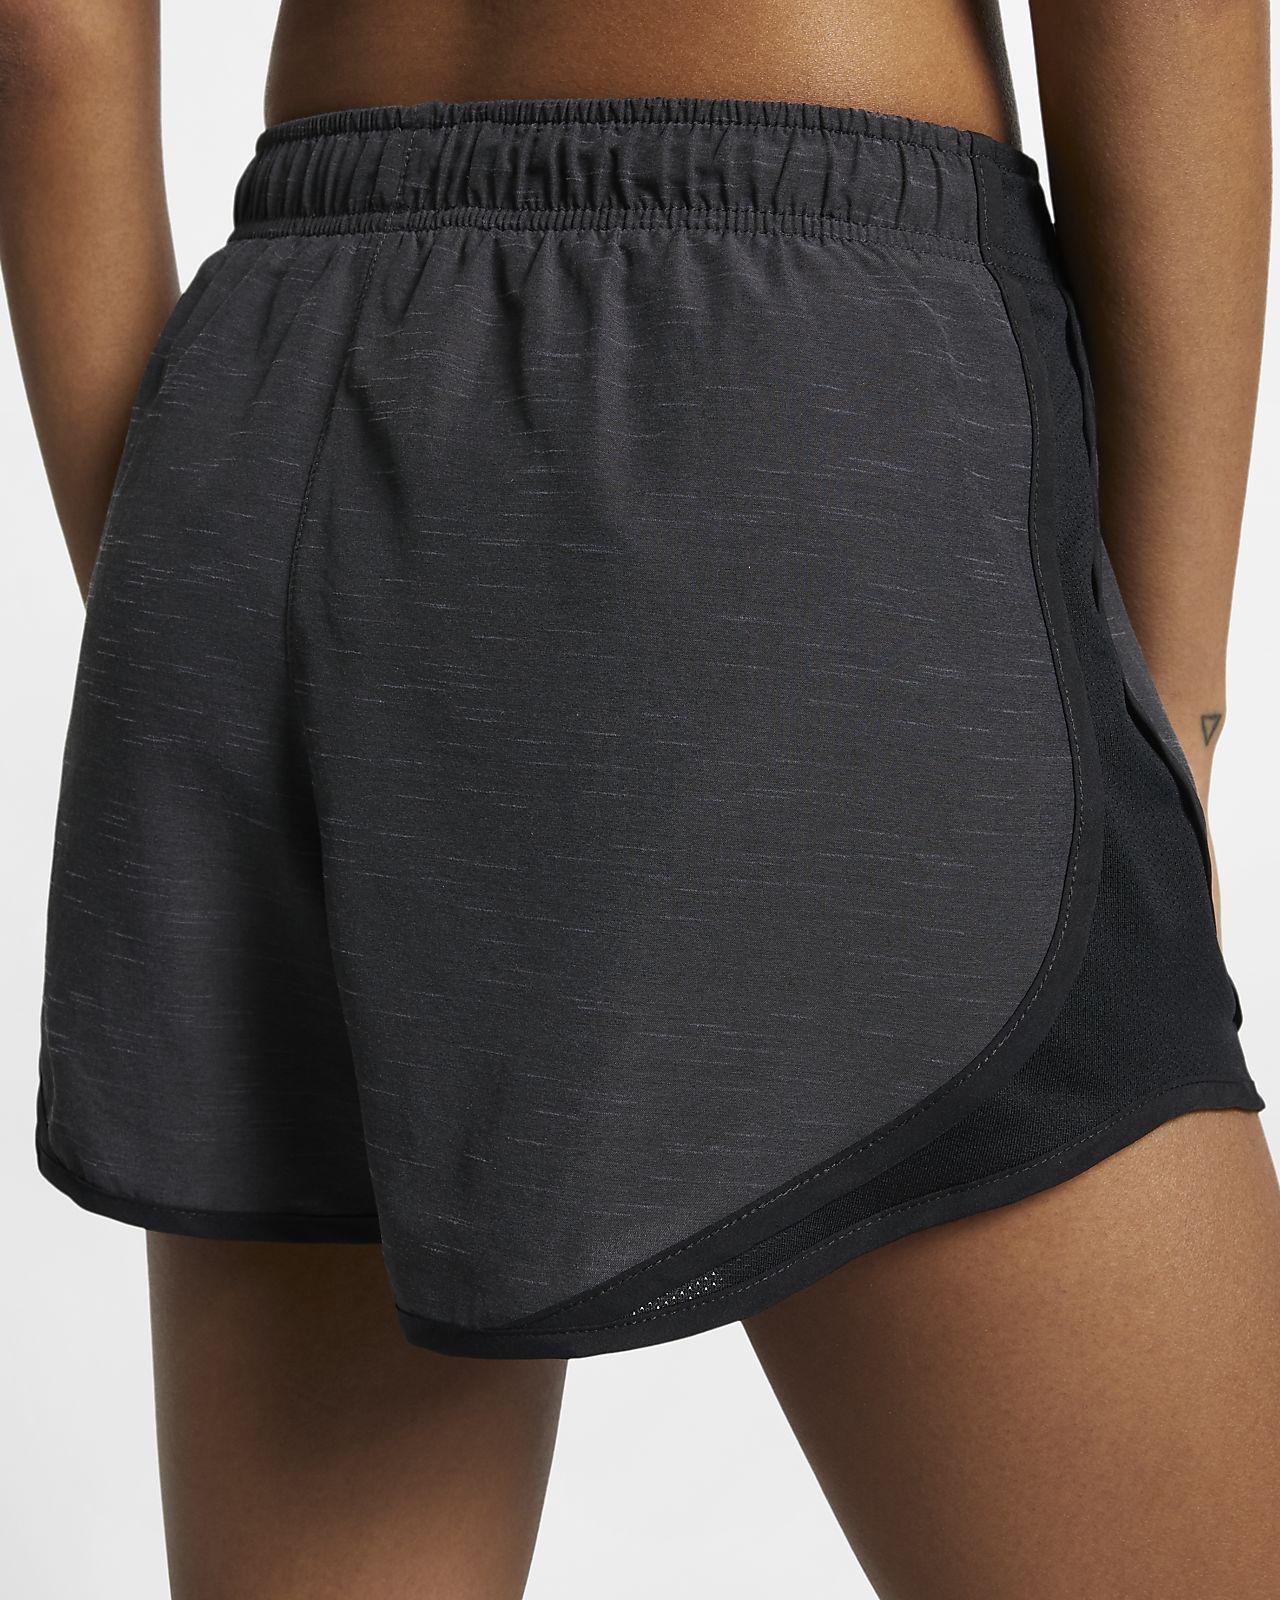 20116484b Low Resolution Nike Tempo Women's Running Shorts Nike Tempo Women's Running  Shorts